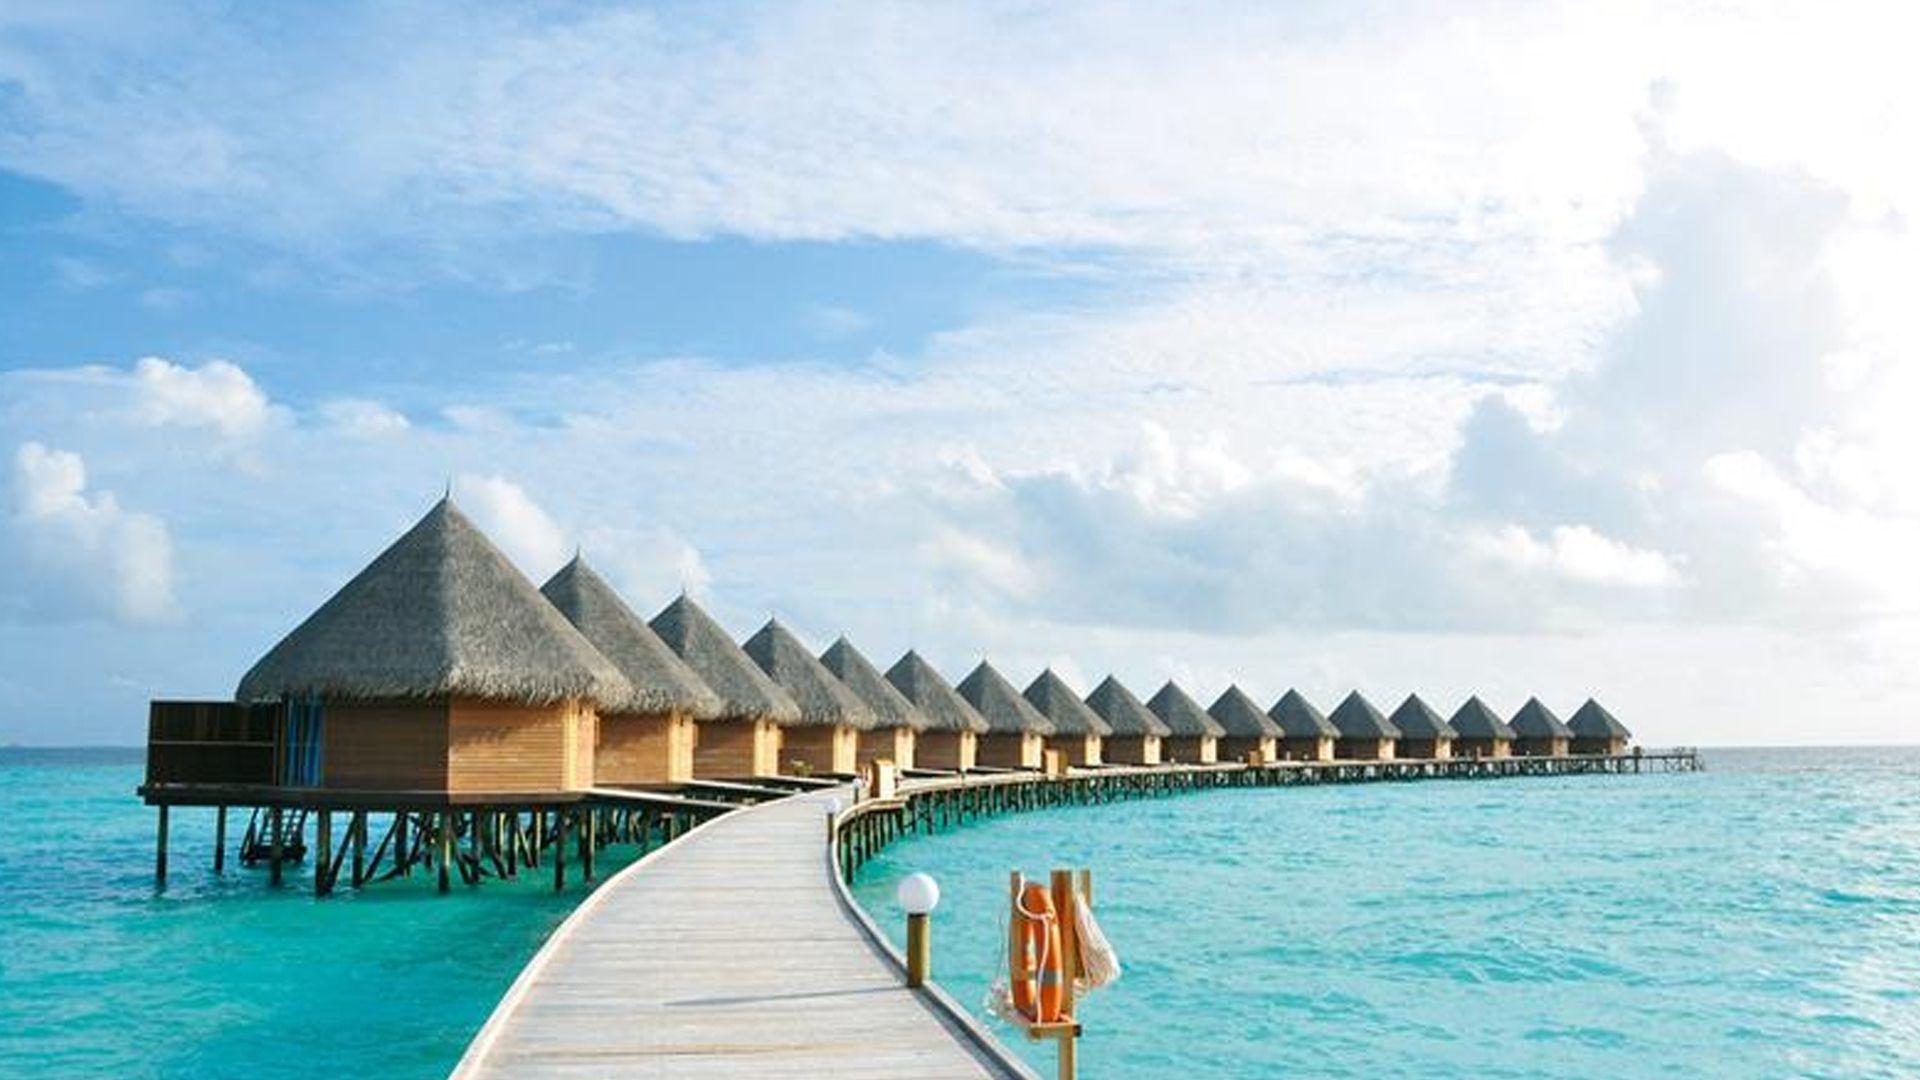 Waterbungalow Malediven Thulhagiri Island Resort